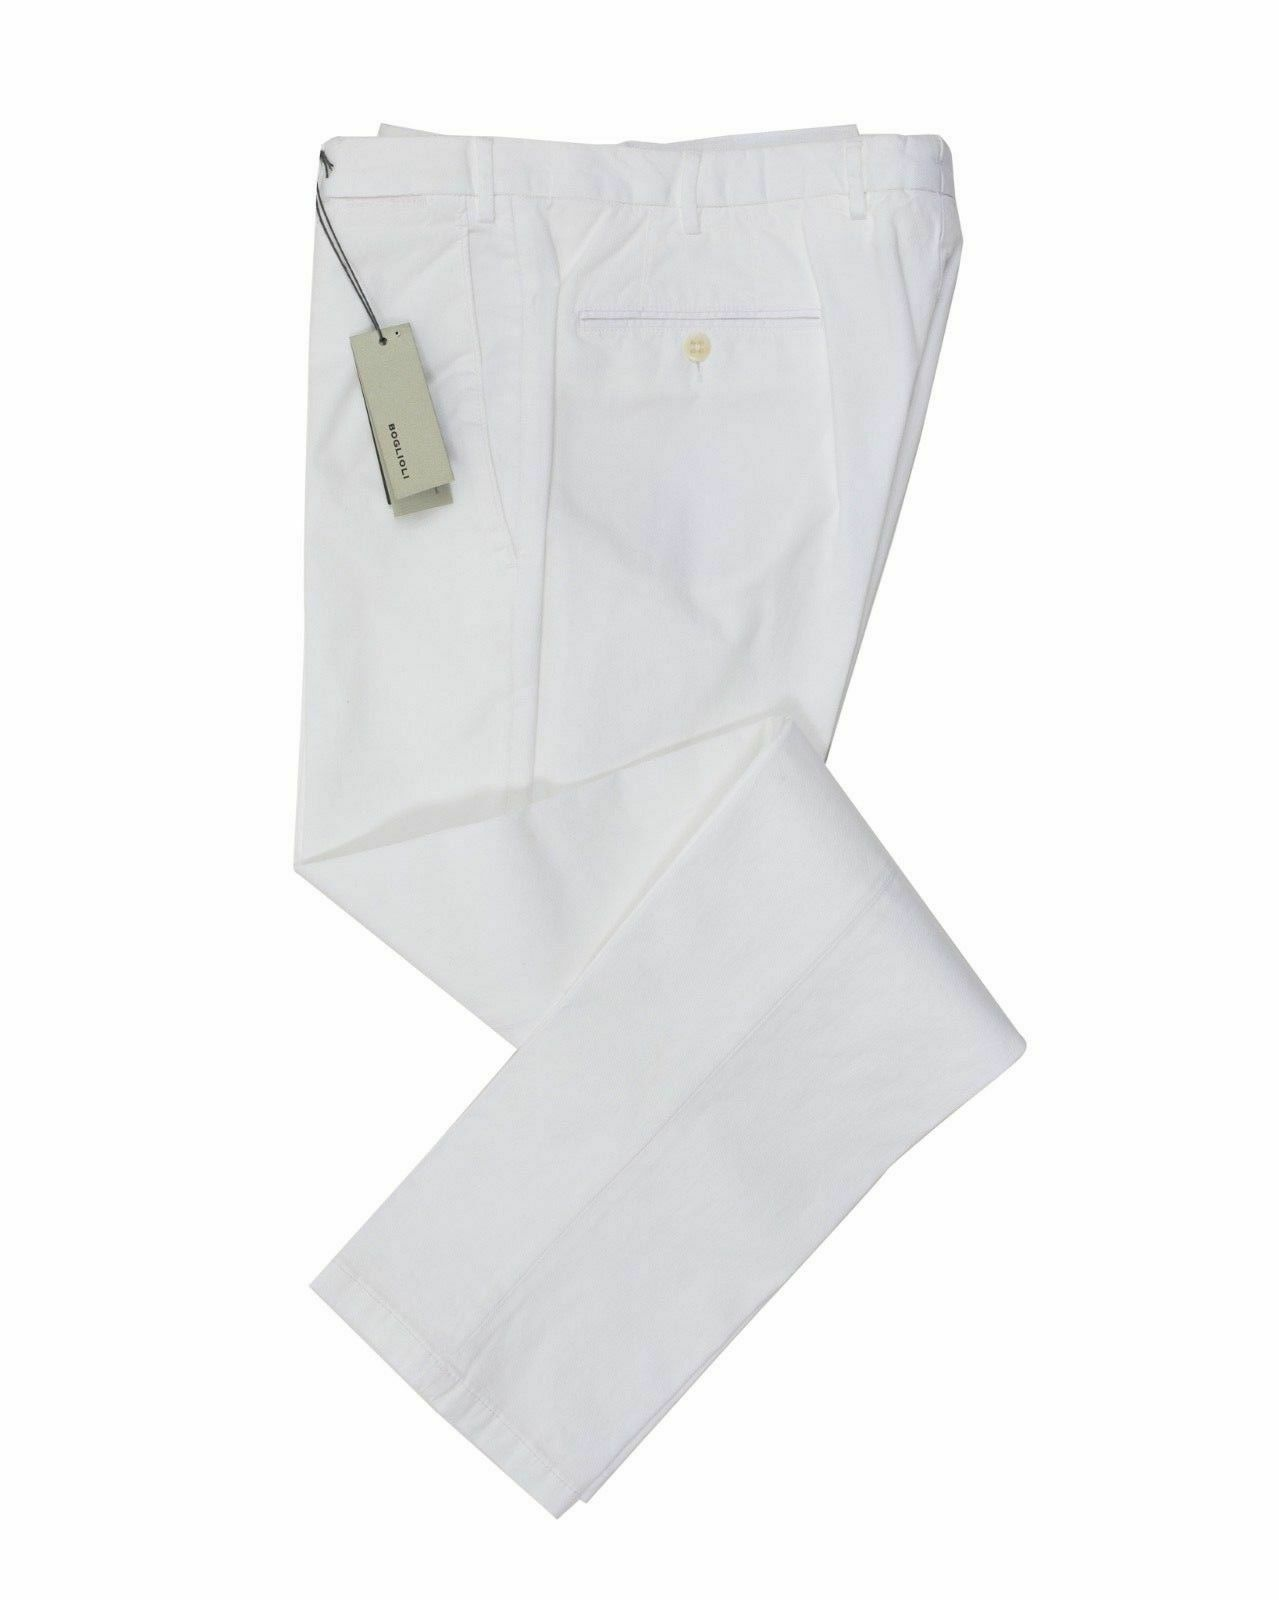 BOGLIOLI White Slim-Fit Stretch Cotton Pants  Made in